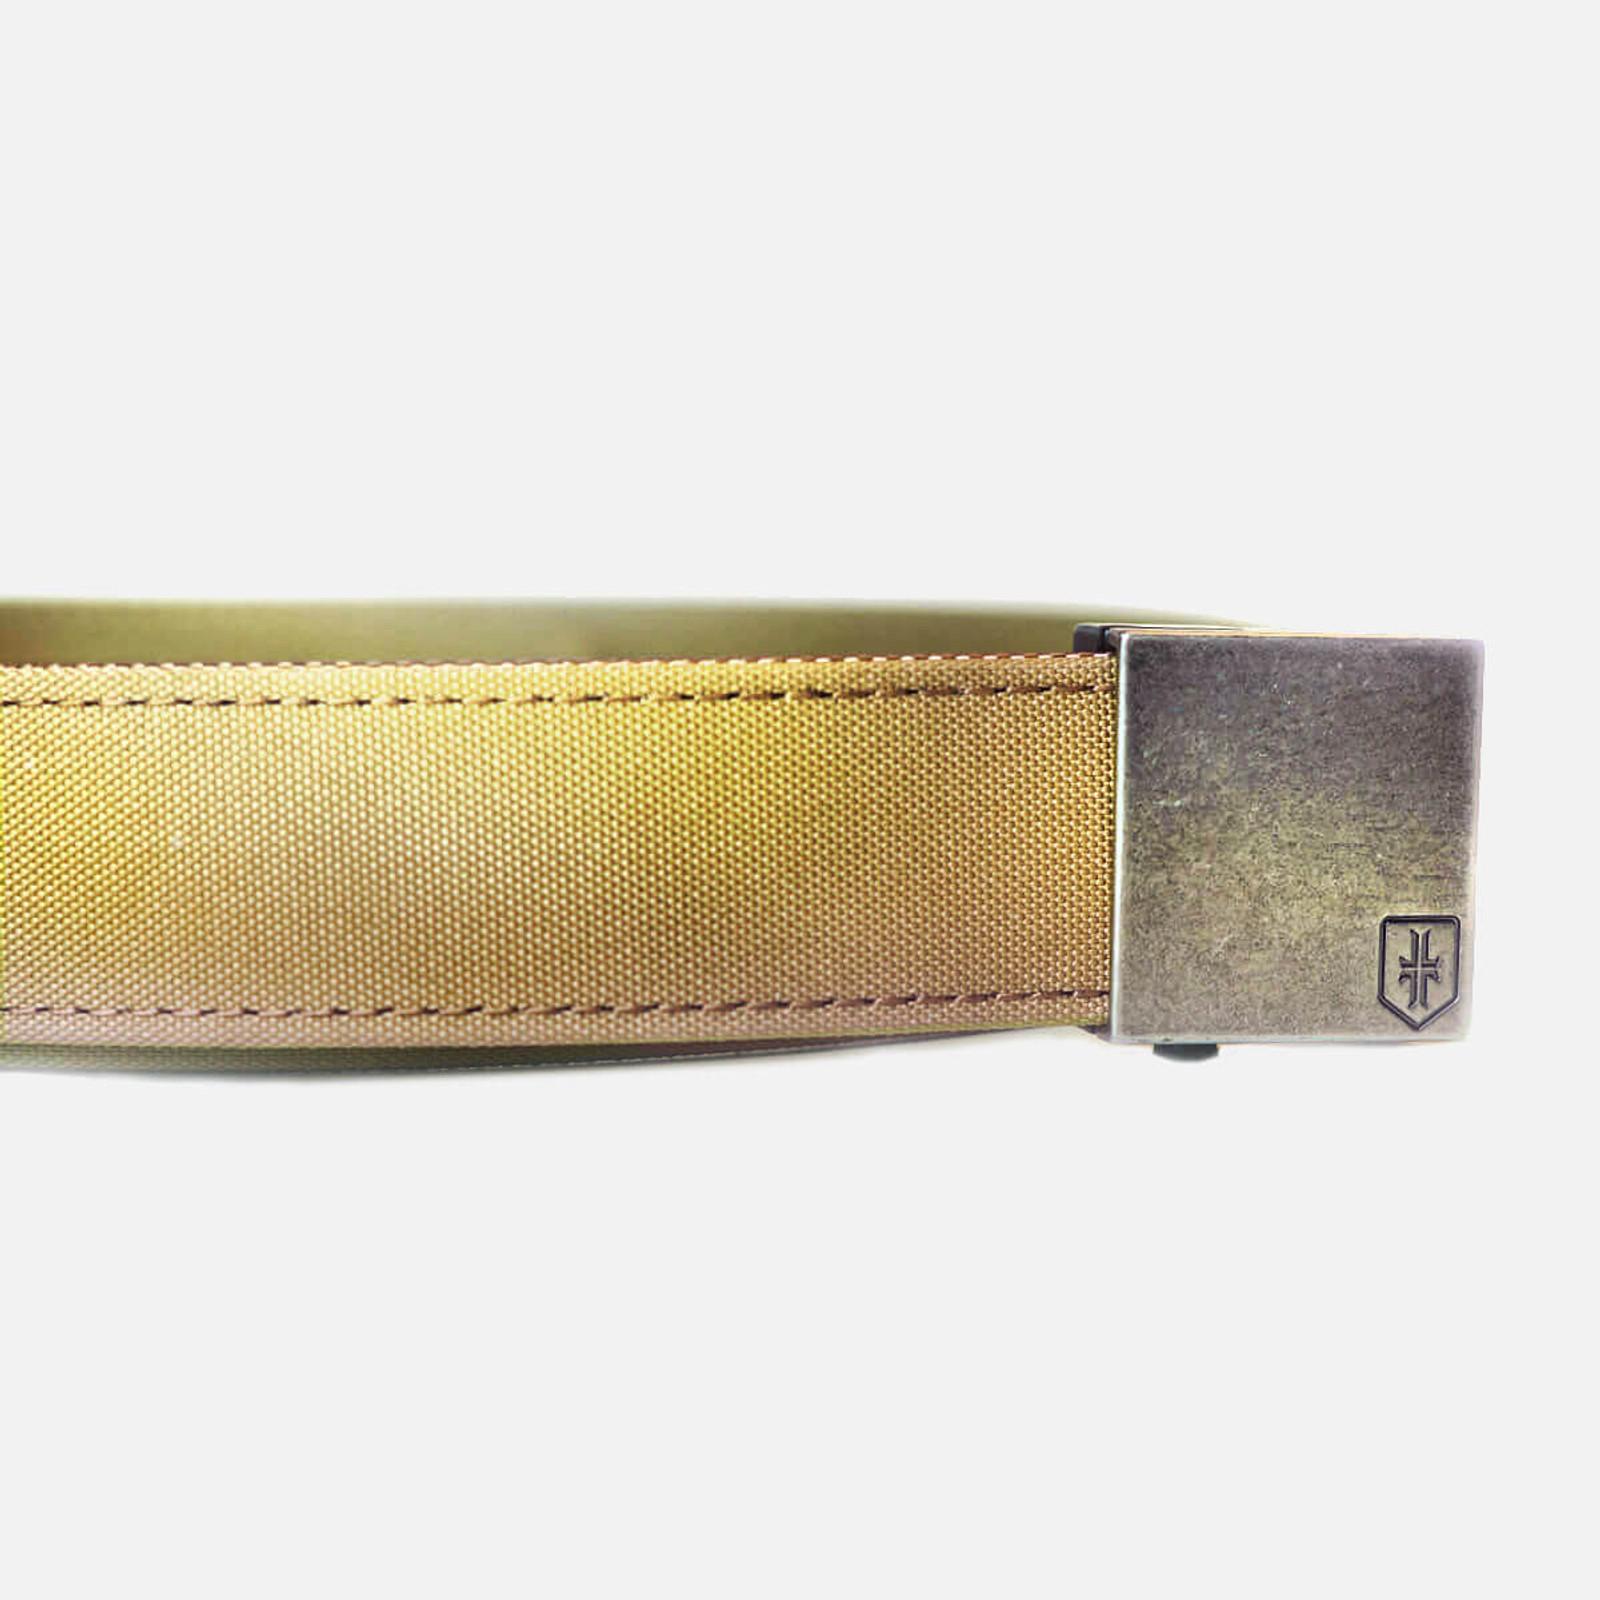 WPS Supreme Appendix Carry Gun Belt Coyote - Nexbelt